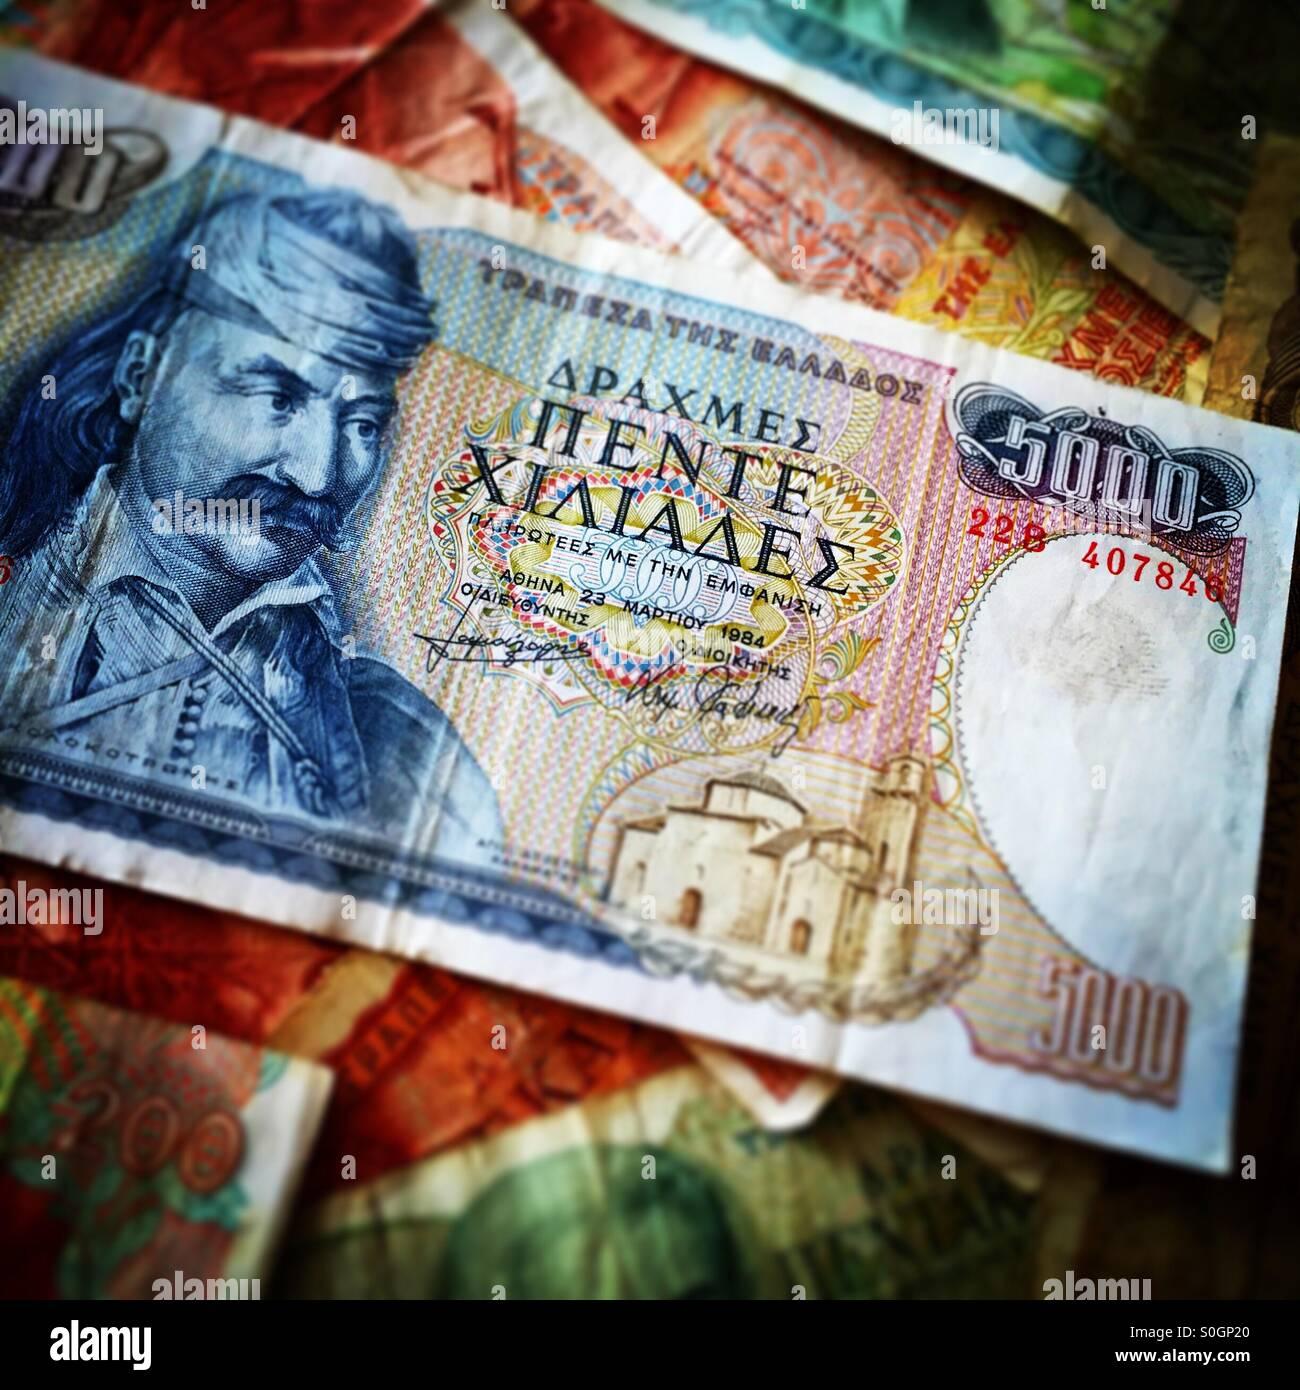 Obsolete Greek drachma bank notes. - Stock Image